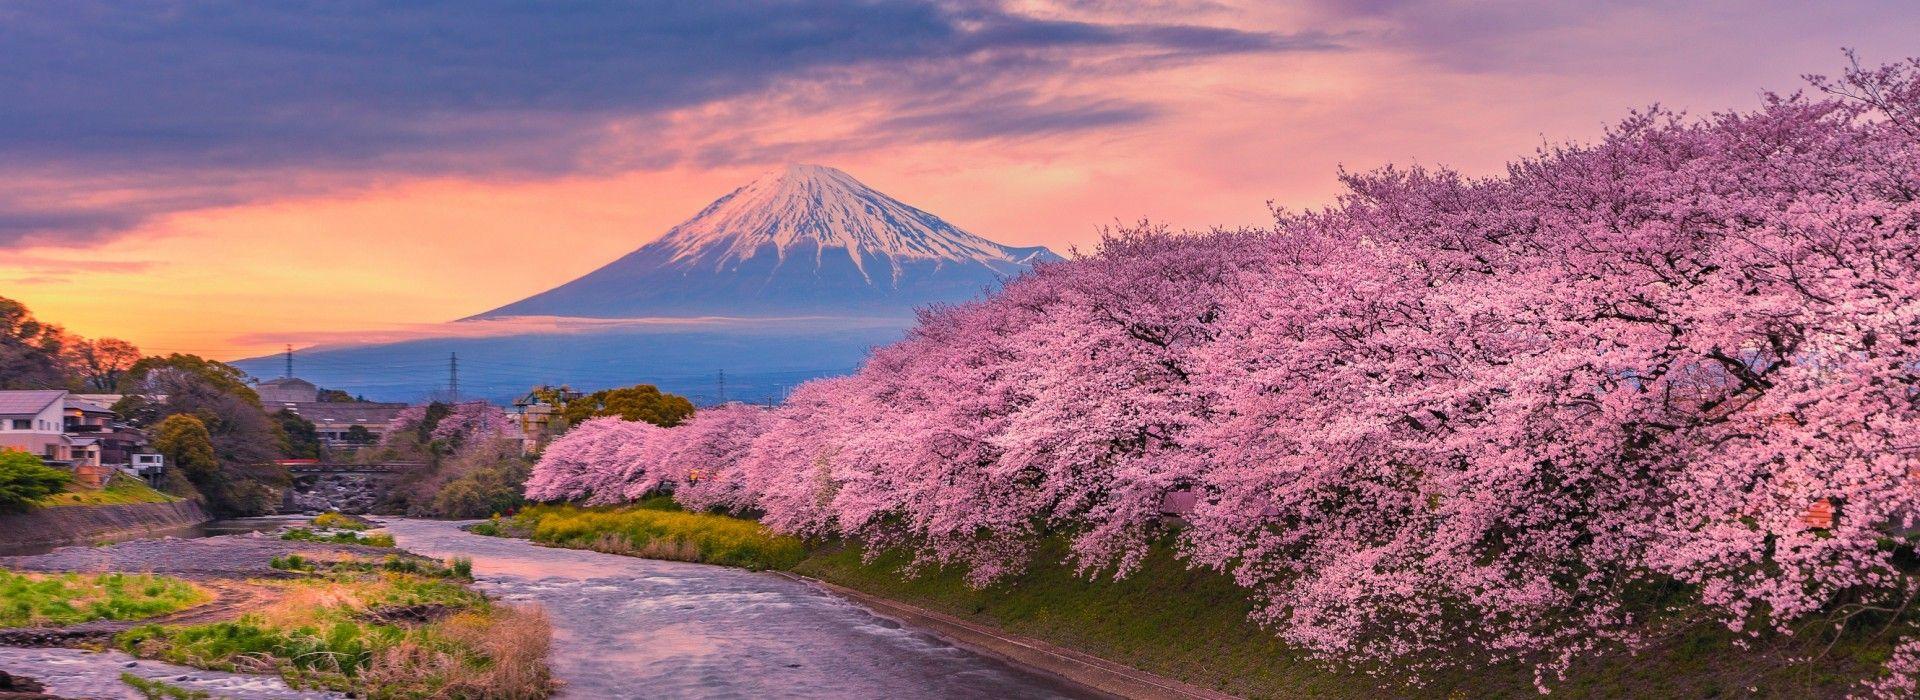 Himeji Tours